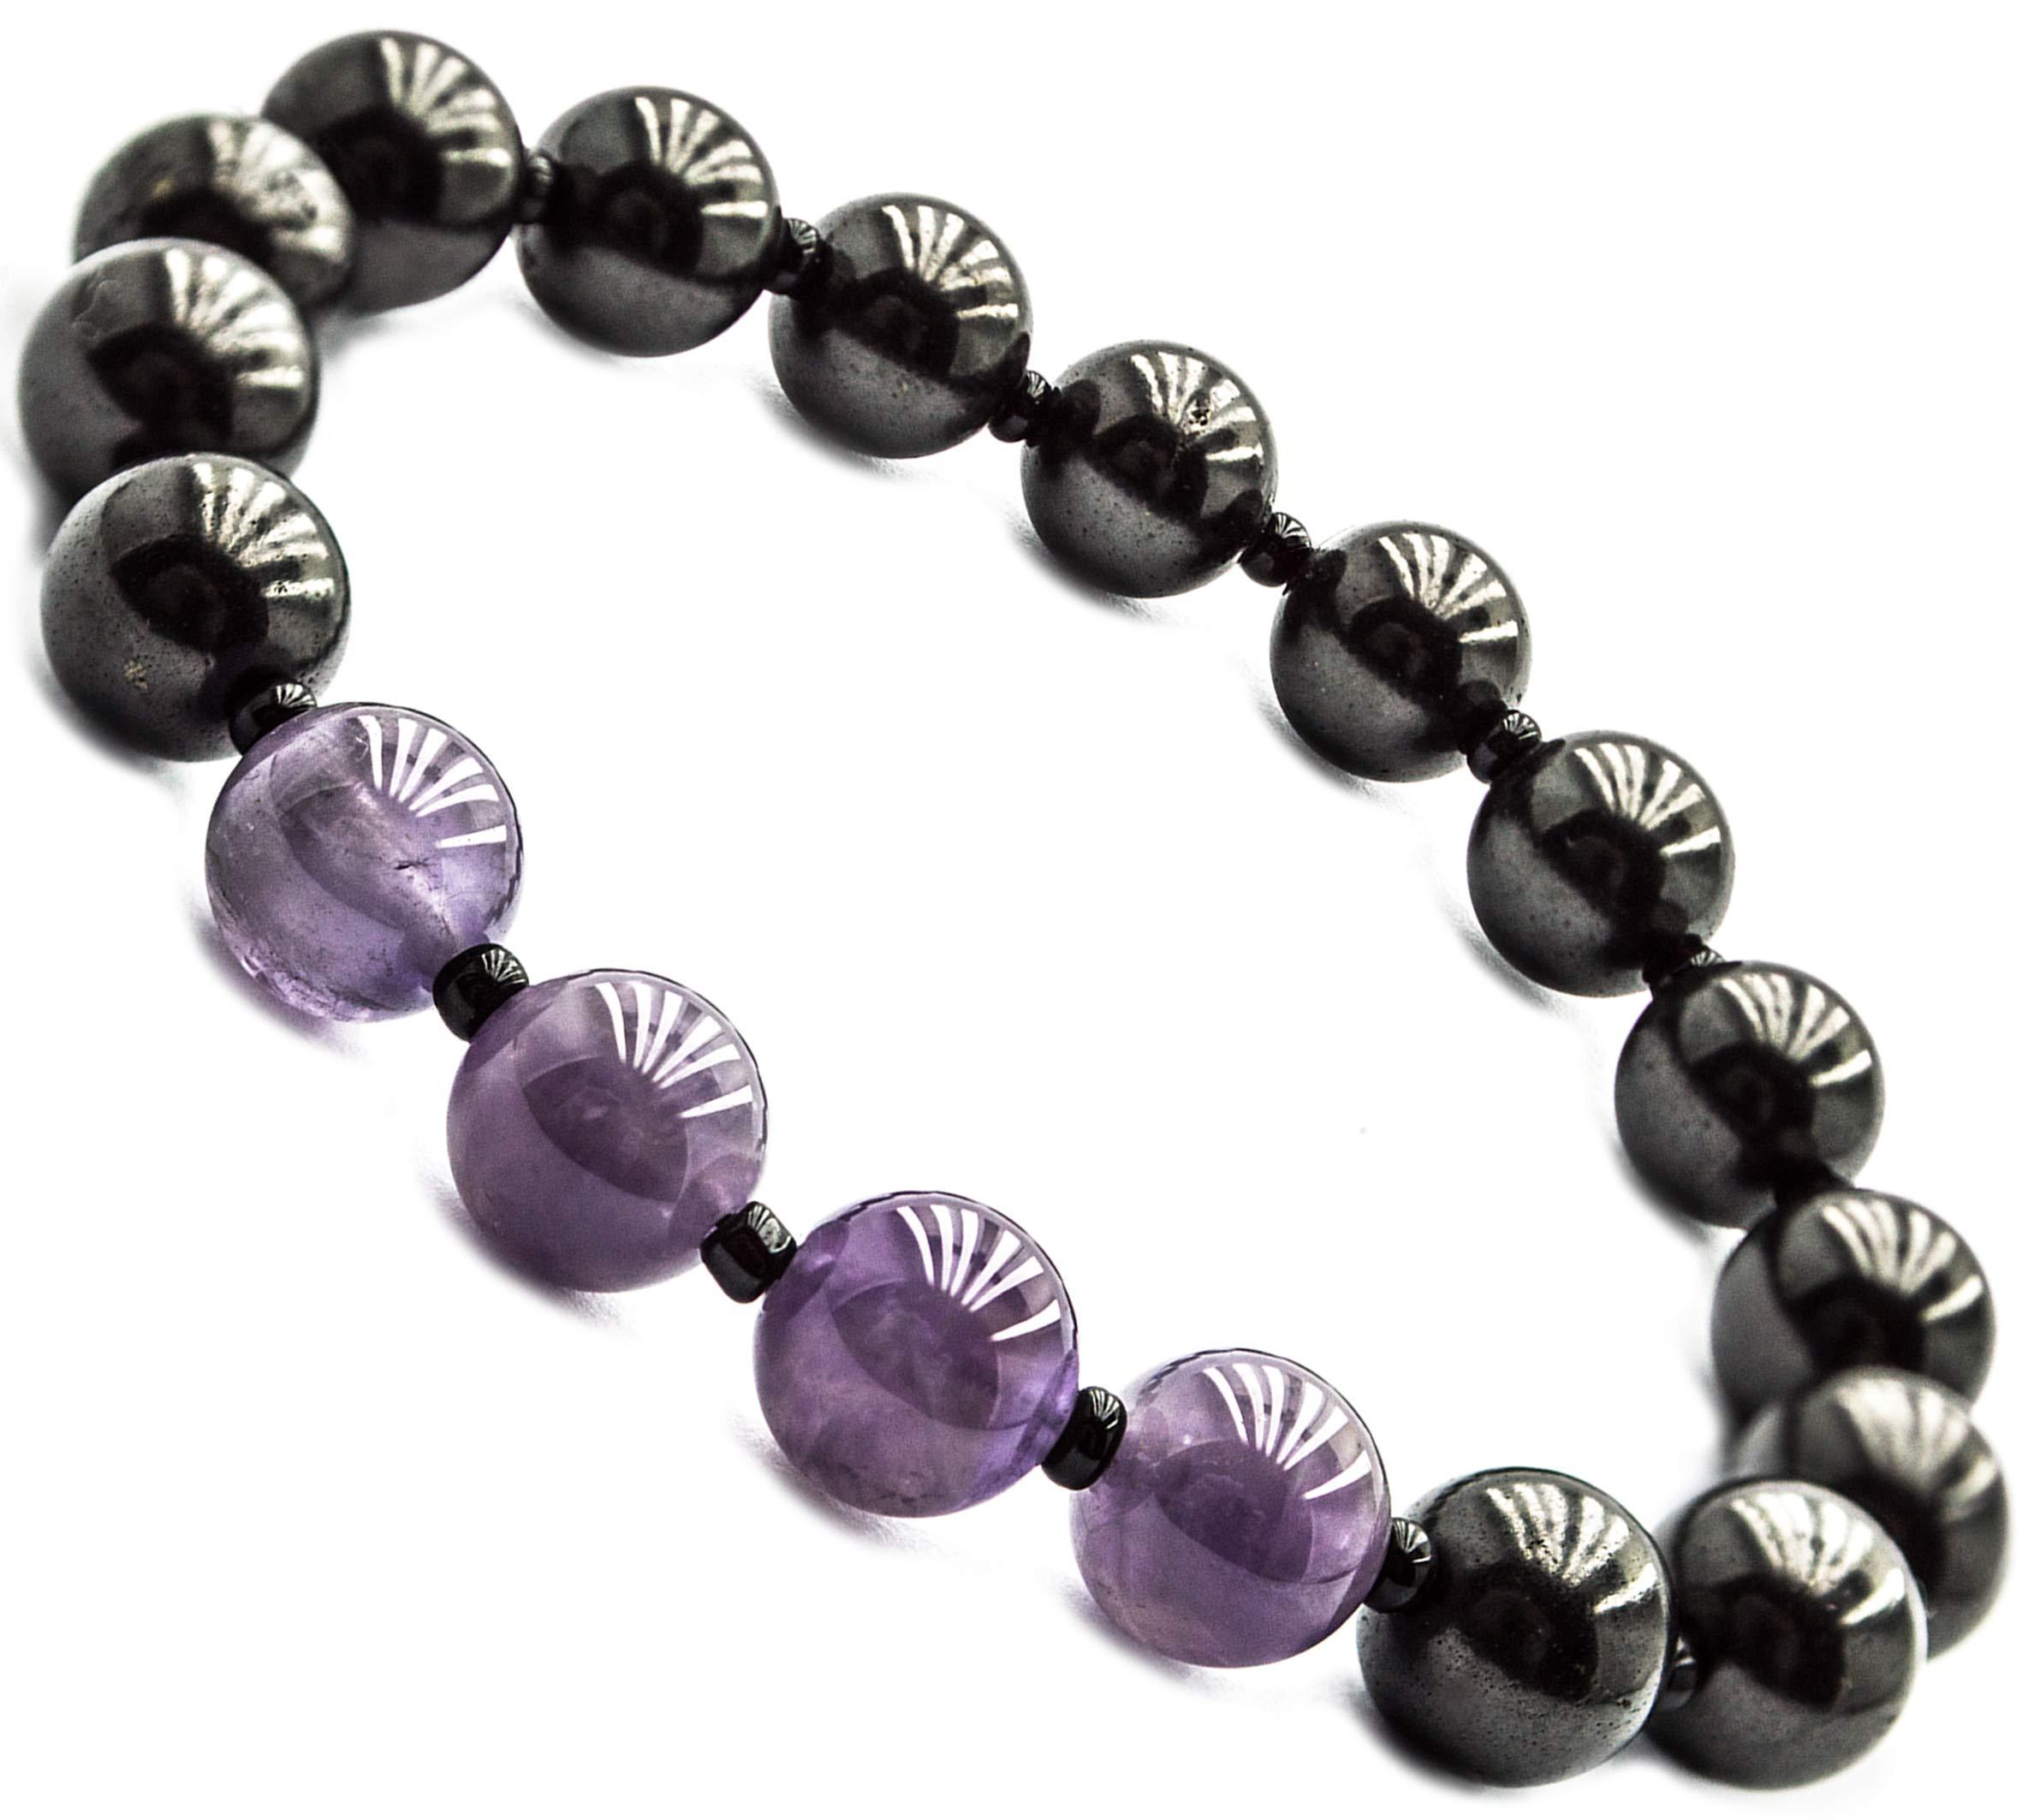 Wallystone Gems Shungite Bracelet Stretch with Natural Shungites and Gemstones Beads (Amethyst) by Wallystone Gems